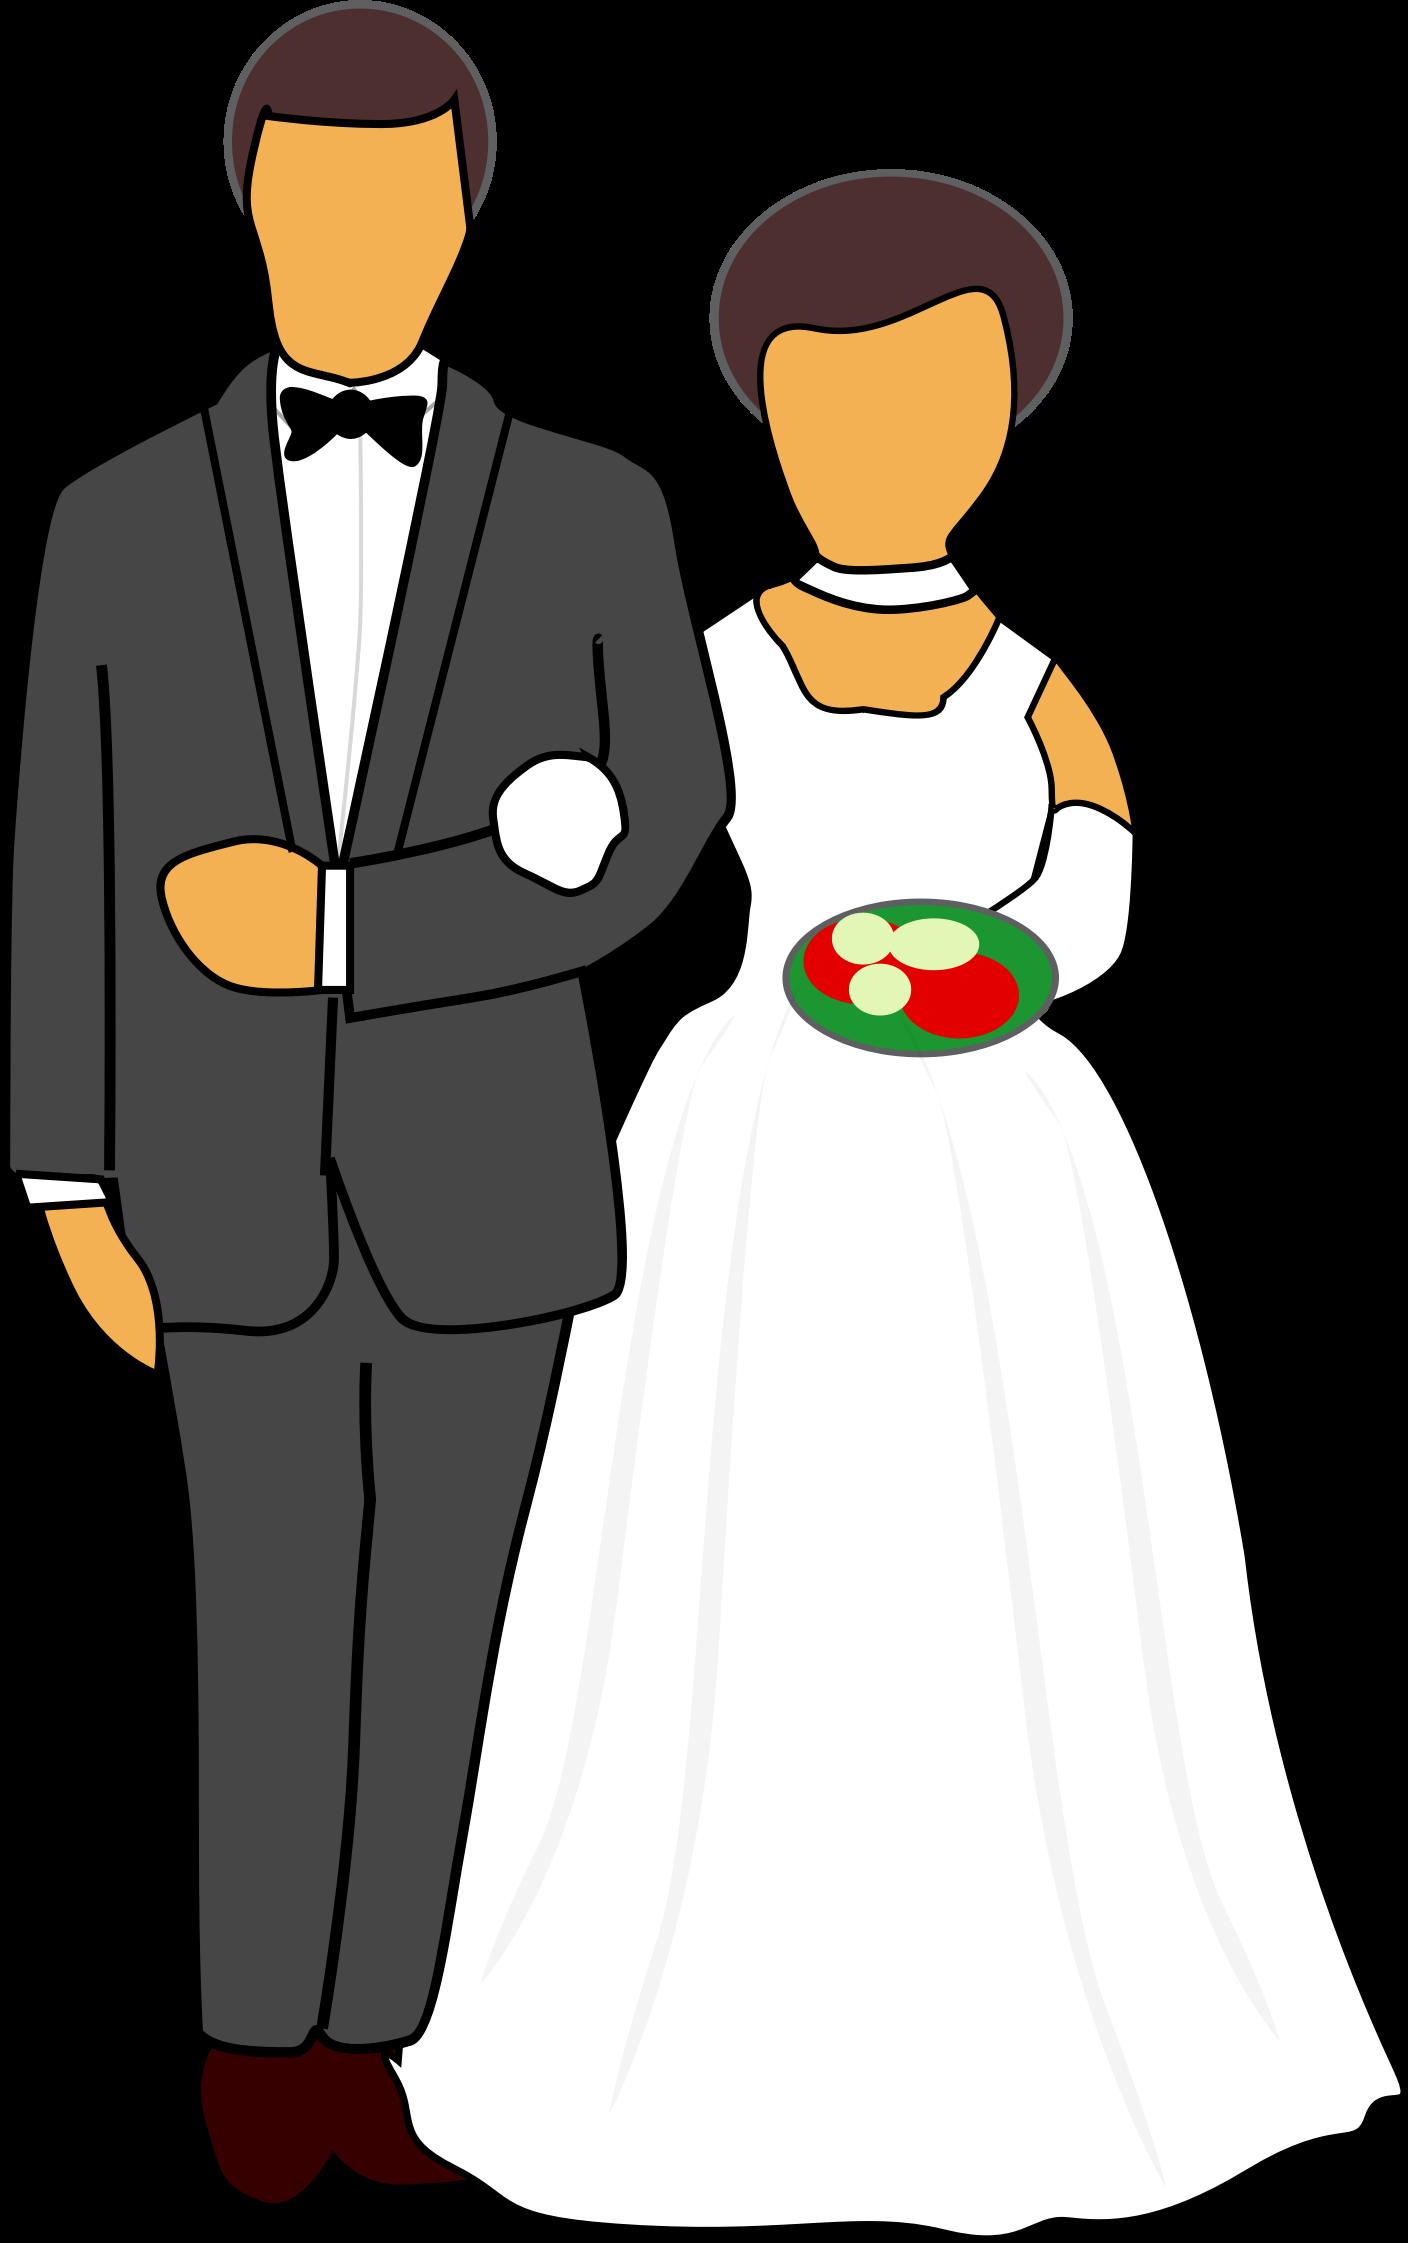 Couple clipart animated. Wedding big image png